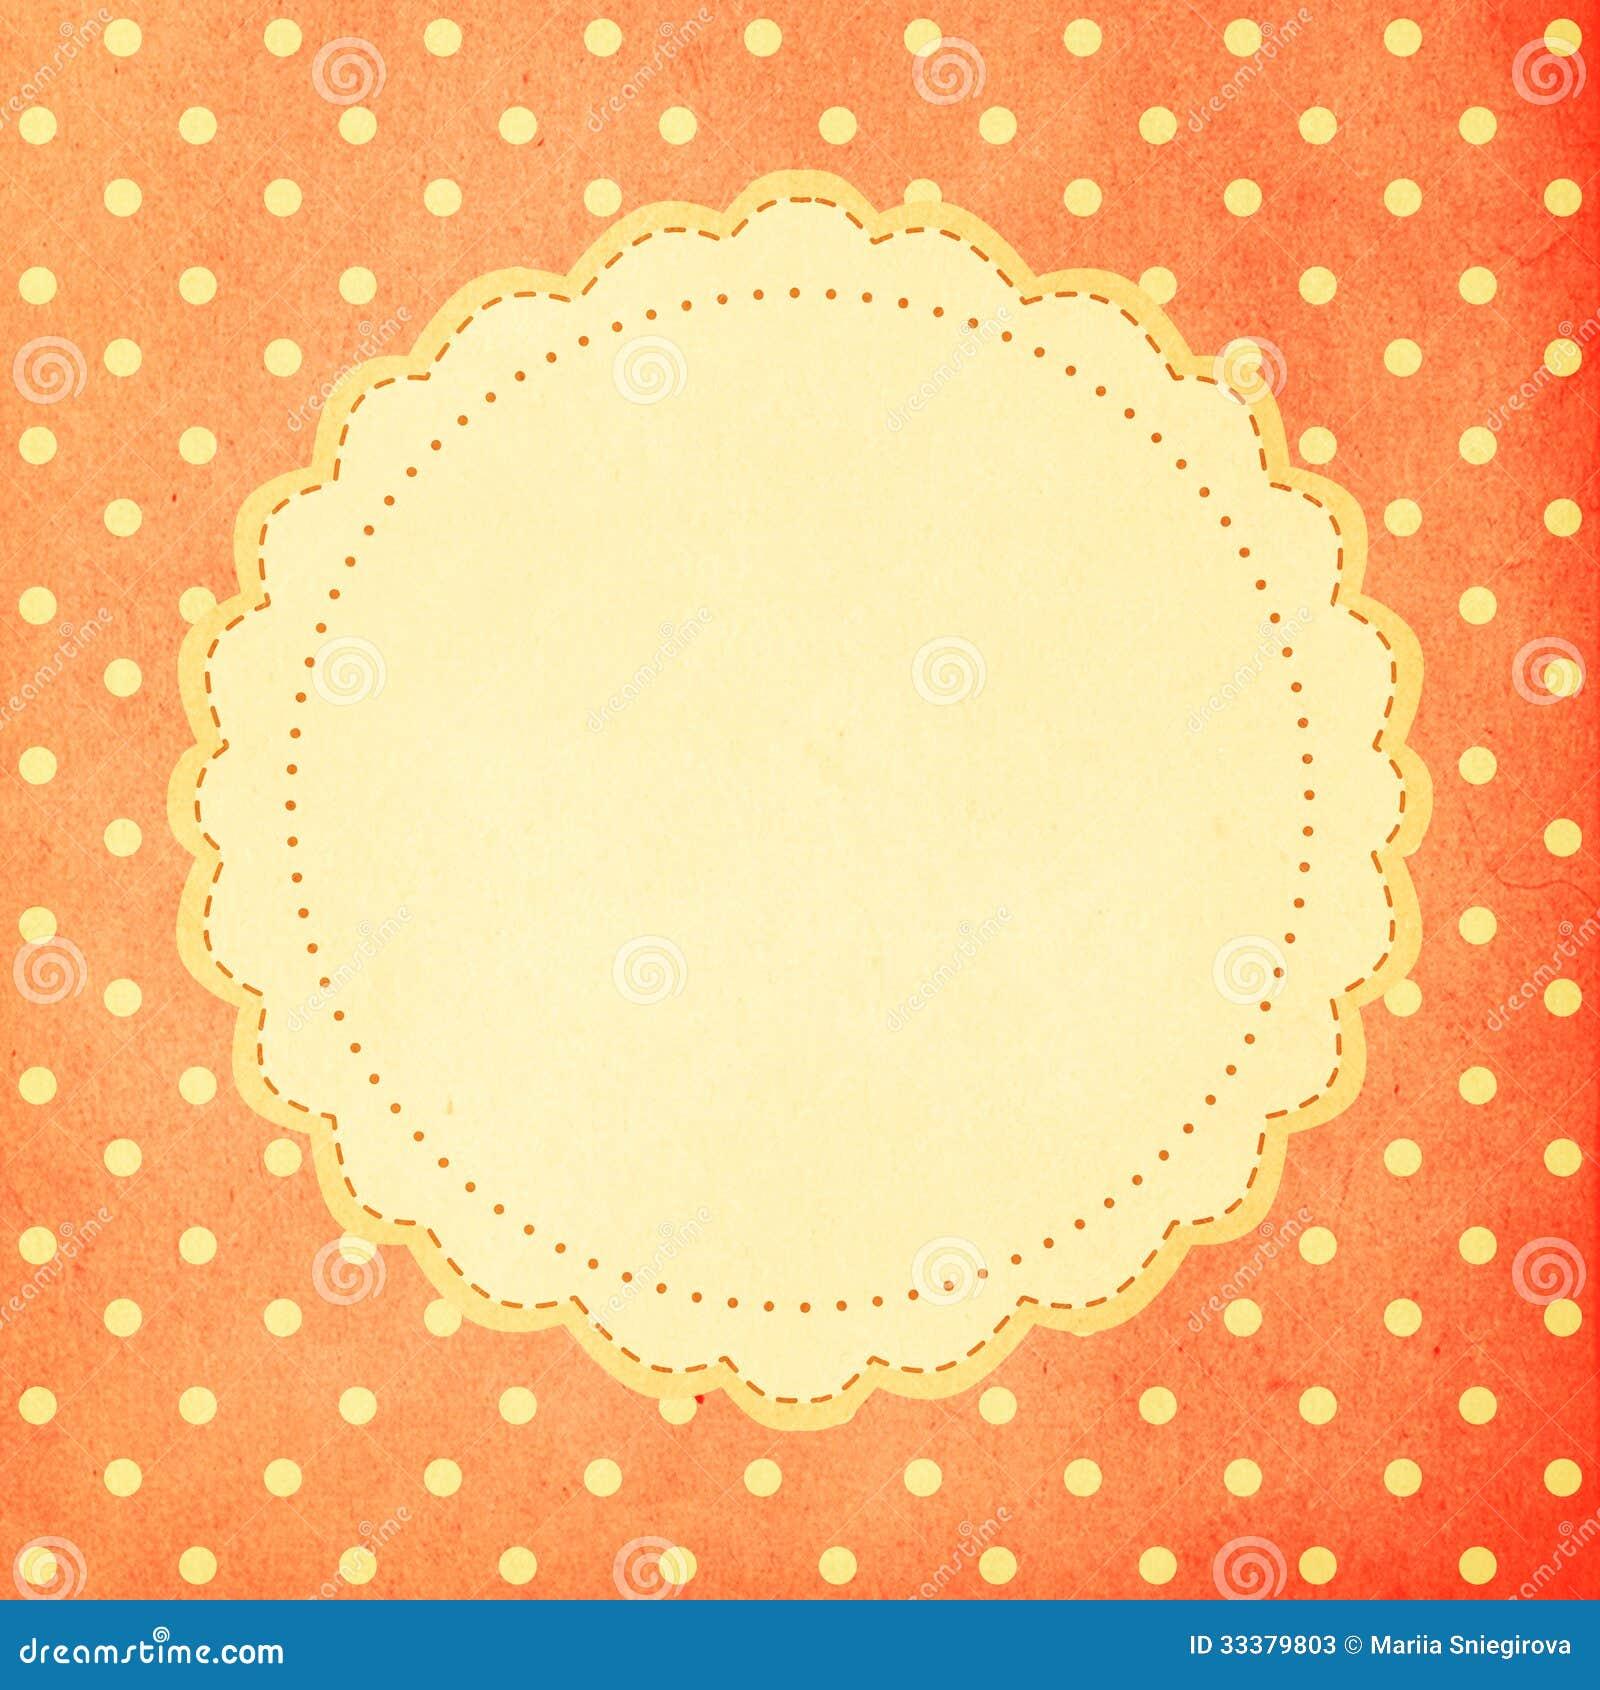 vintage background polka dot style stock photos image